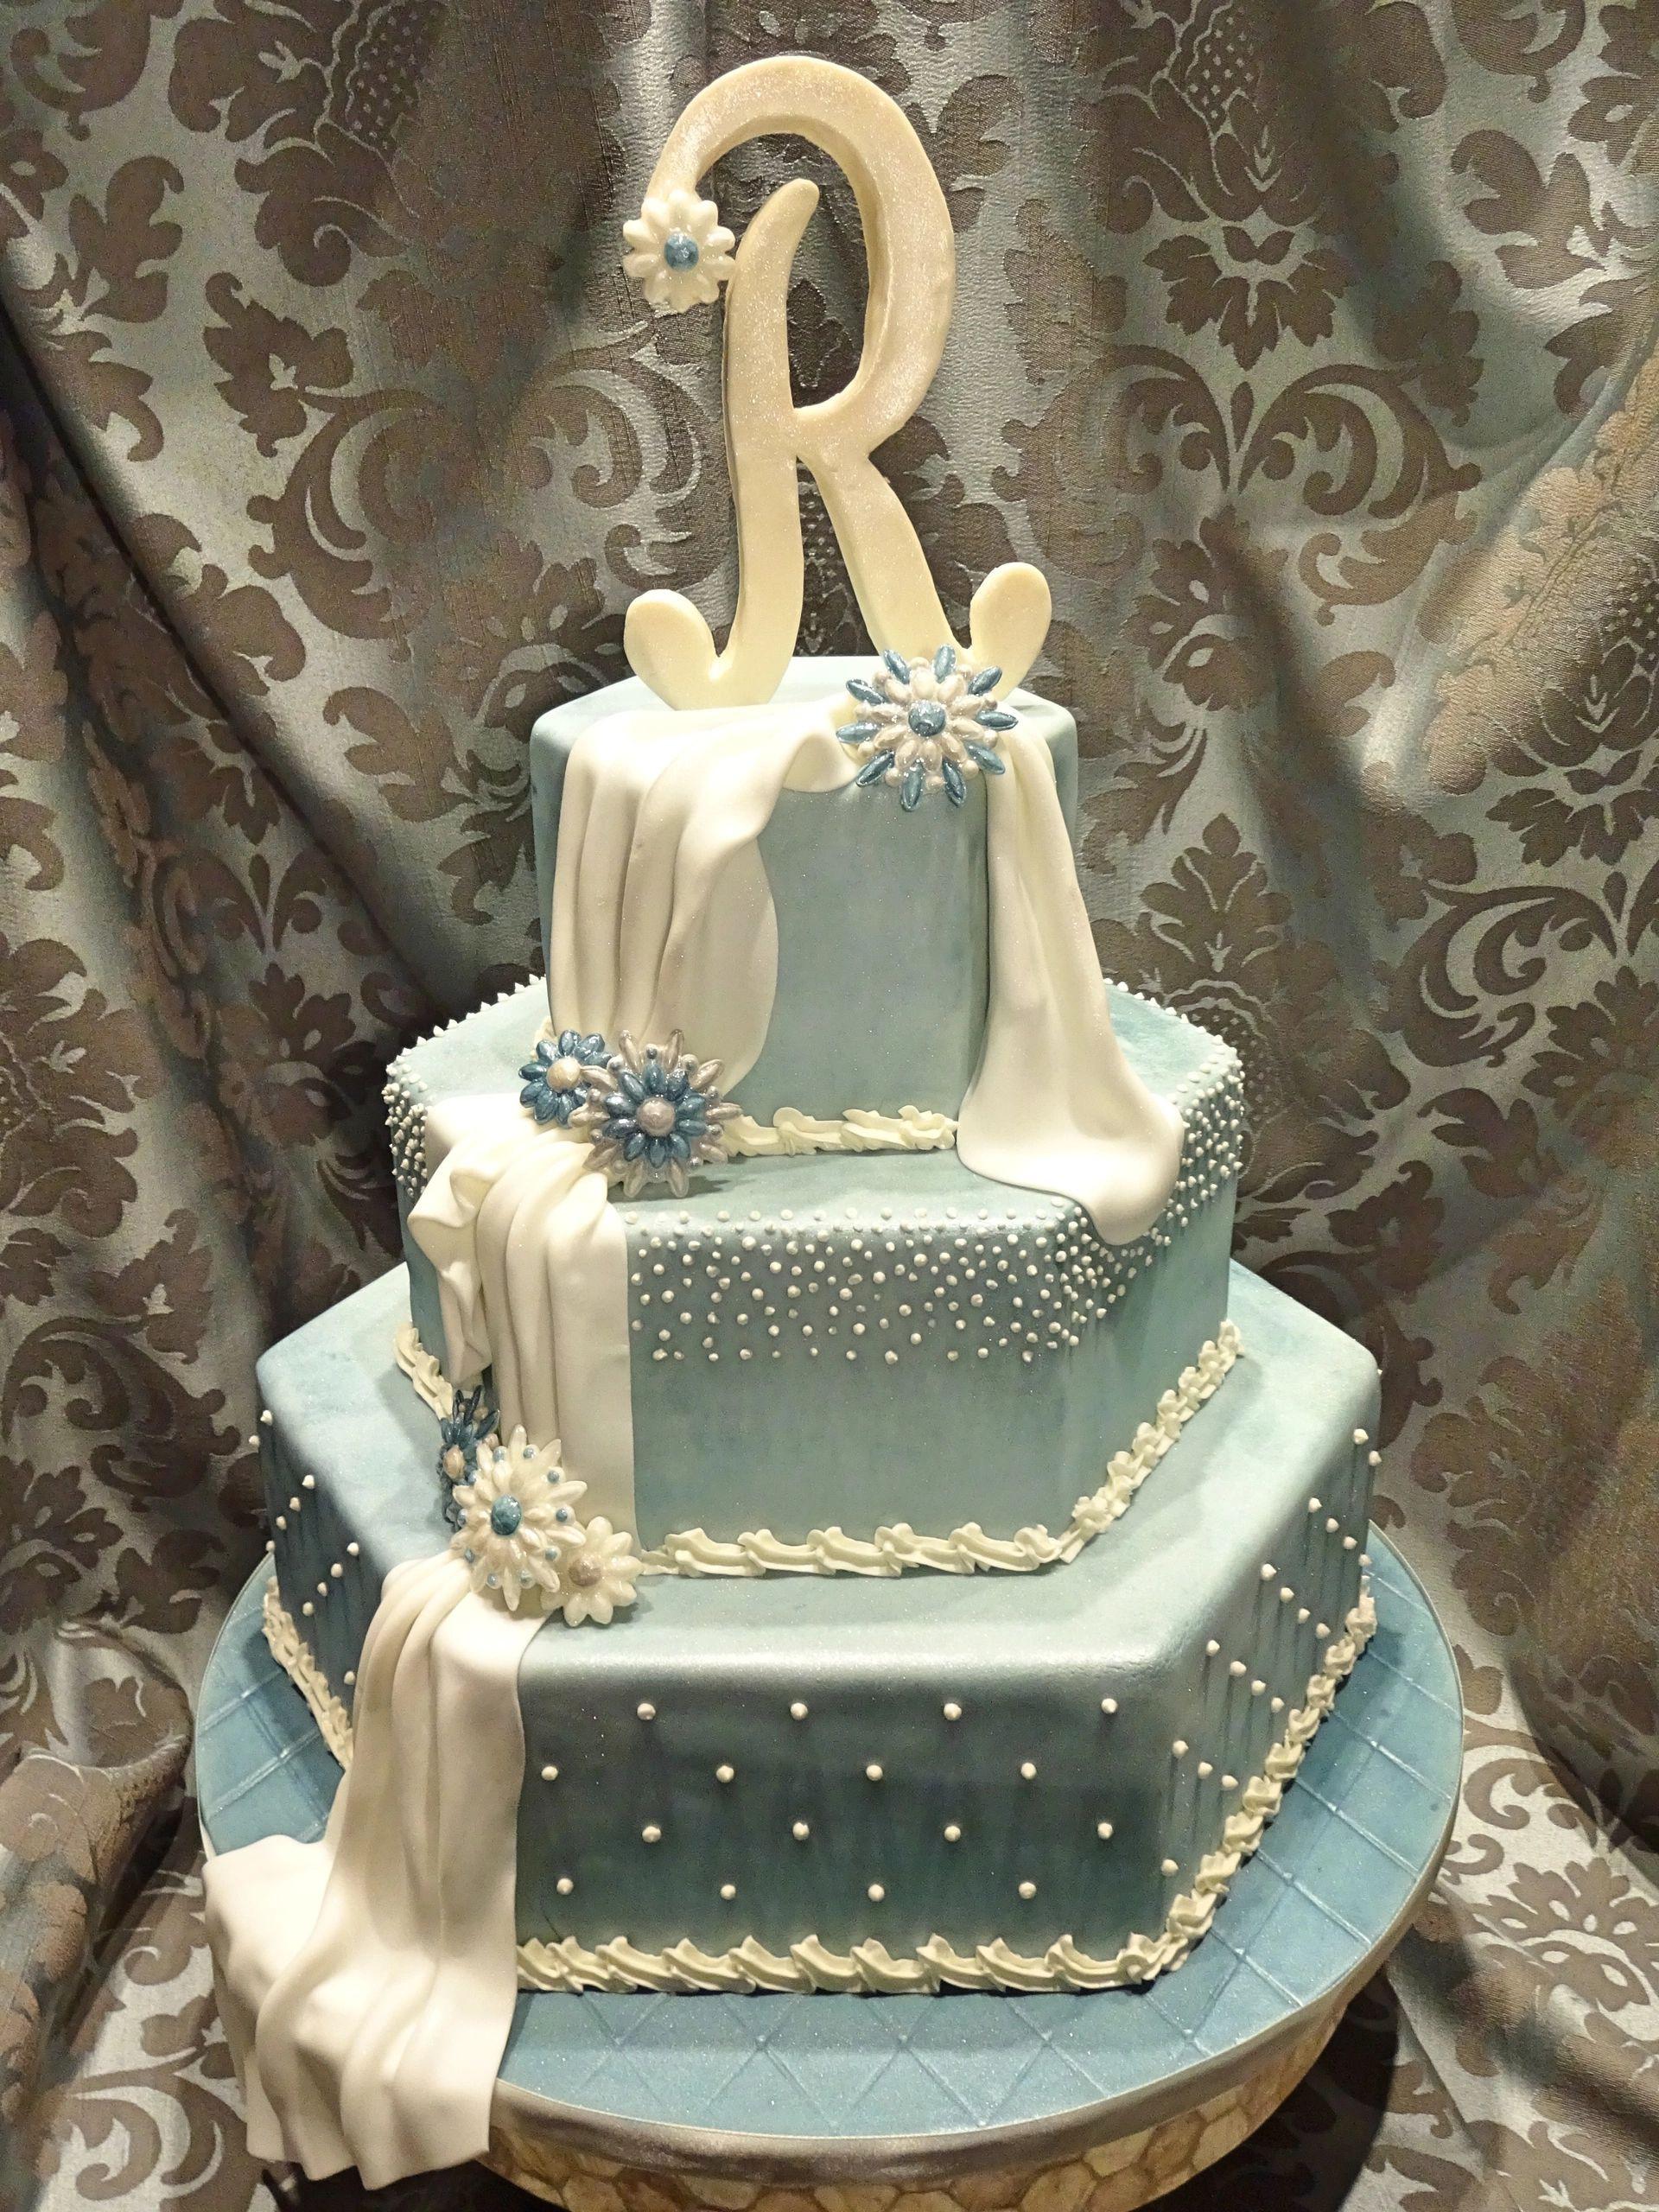 Wedding Cakes Rapid City Sd  Wedding Cakes Rapid City Sd